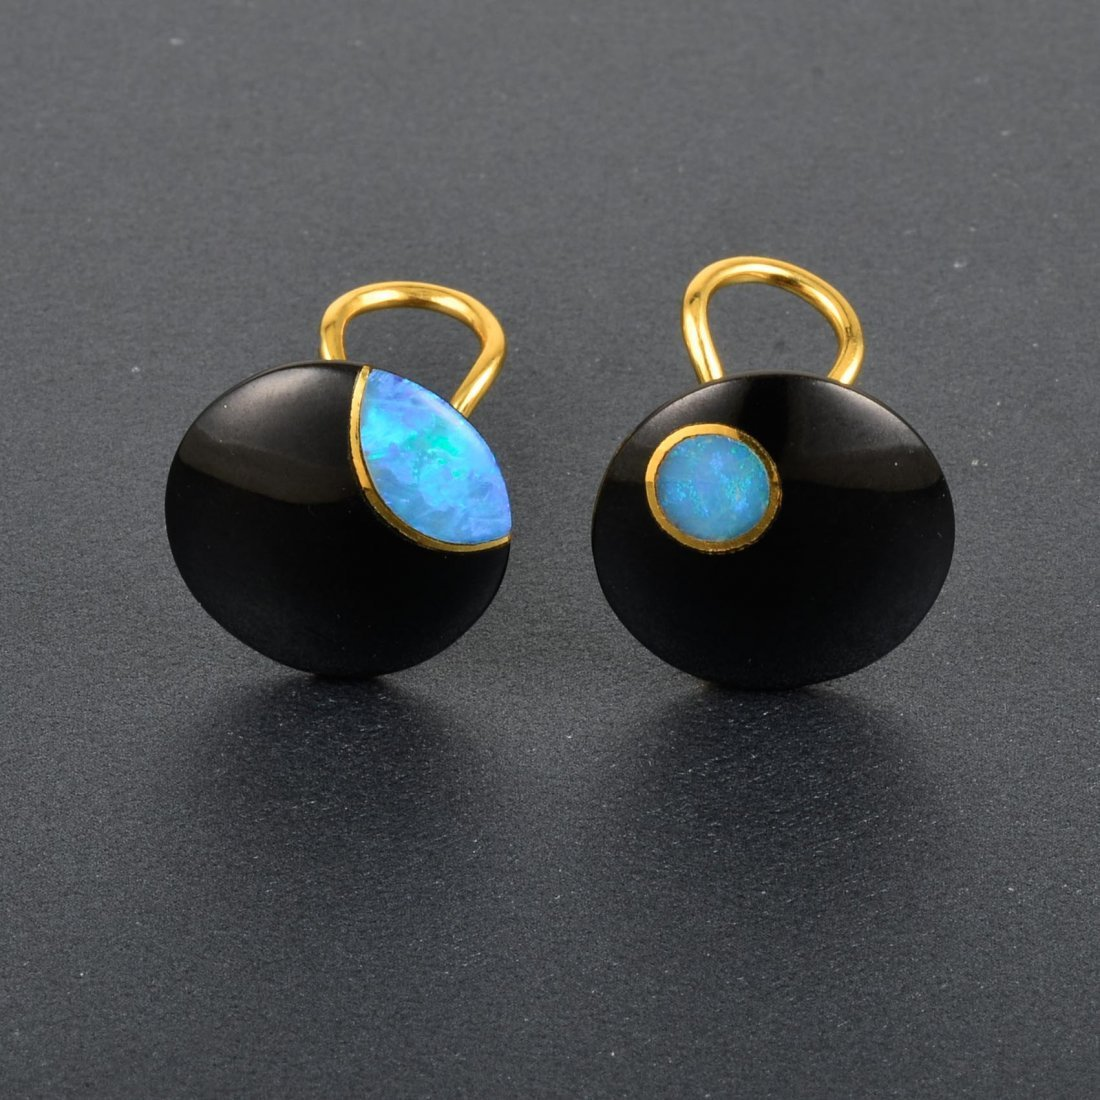 Tiffany & Co., 18K YG Onyx and Opal Earrings